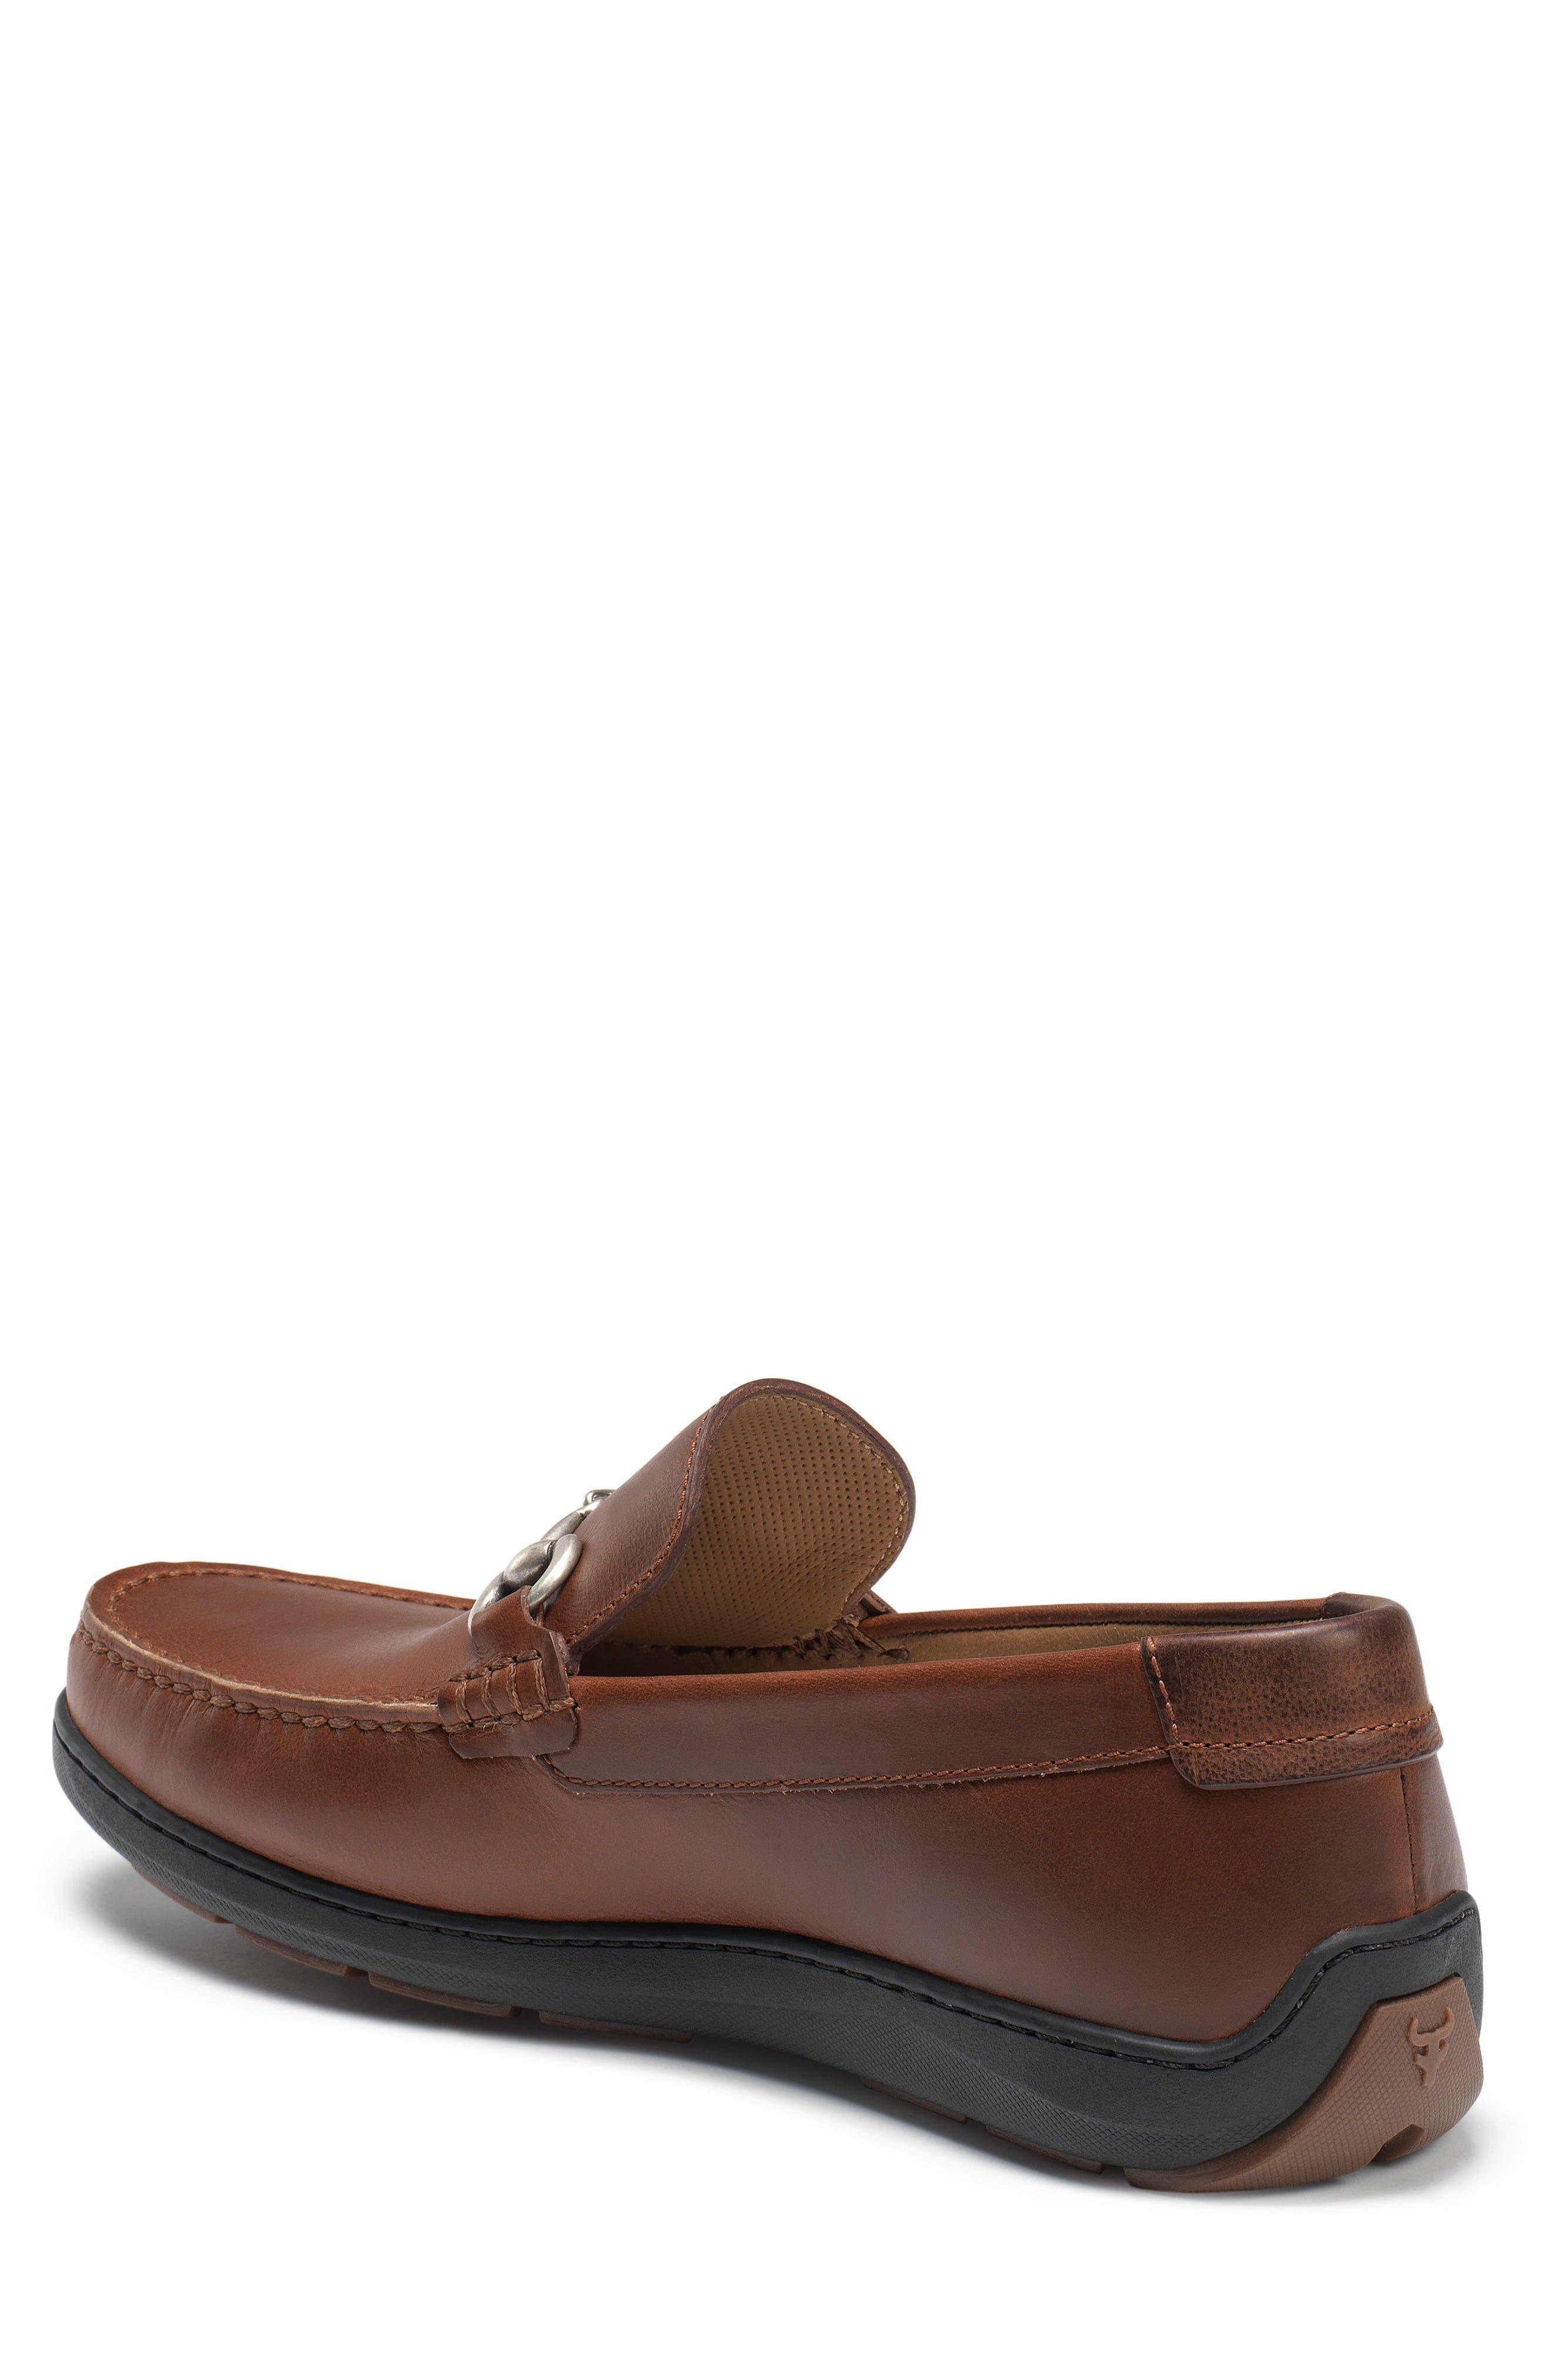 Stalworth Bit Loafer,                             Alternate thumbnail 2, color,                             Brandy Leather